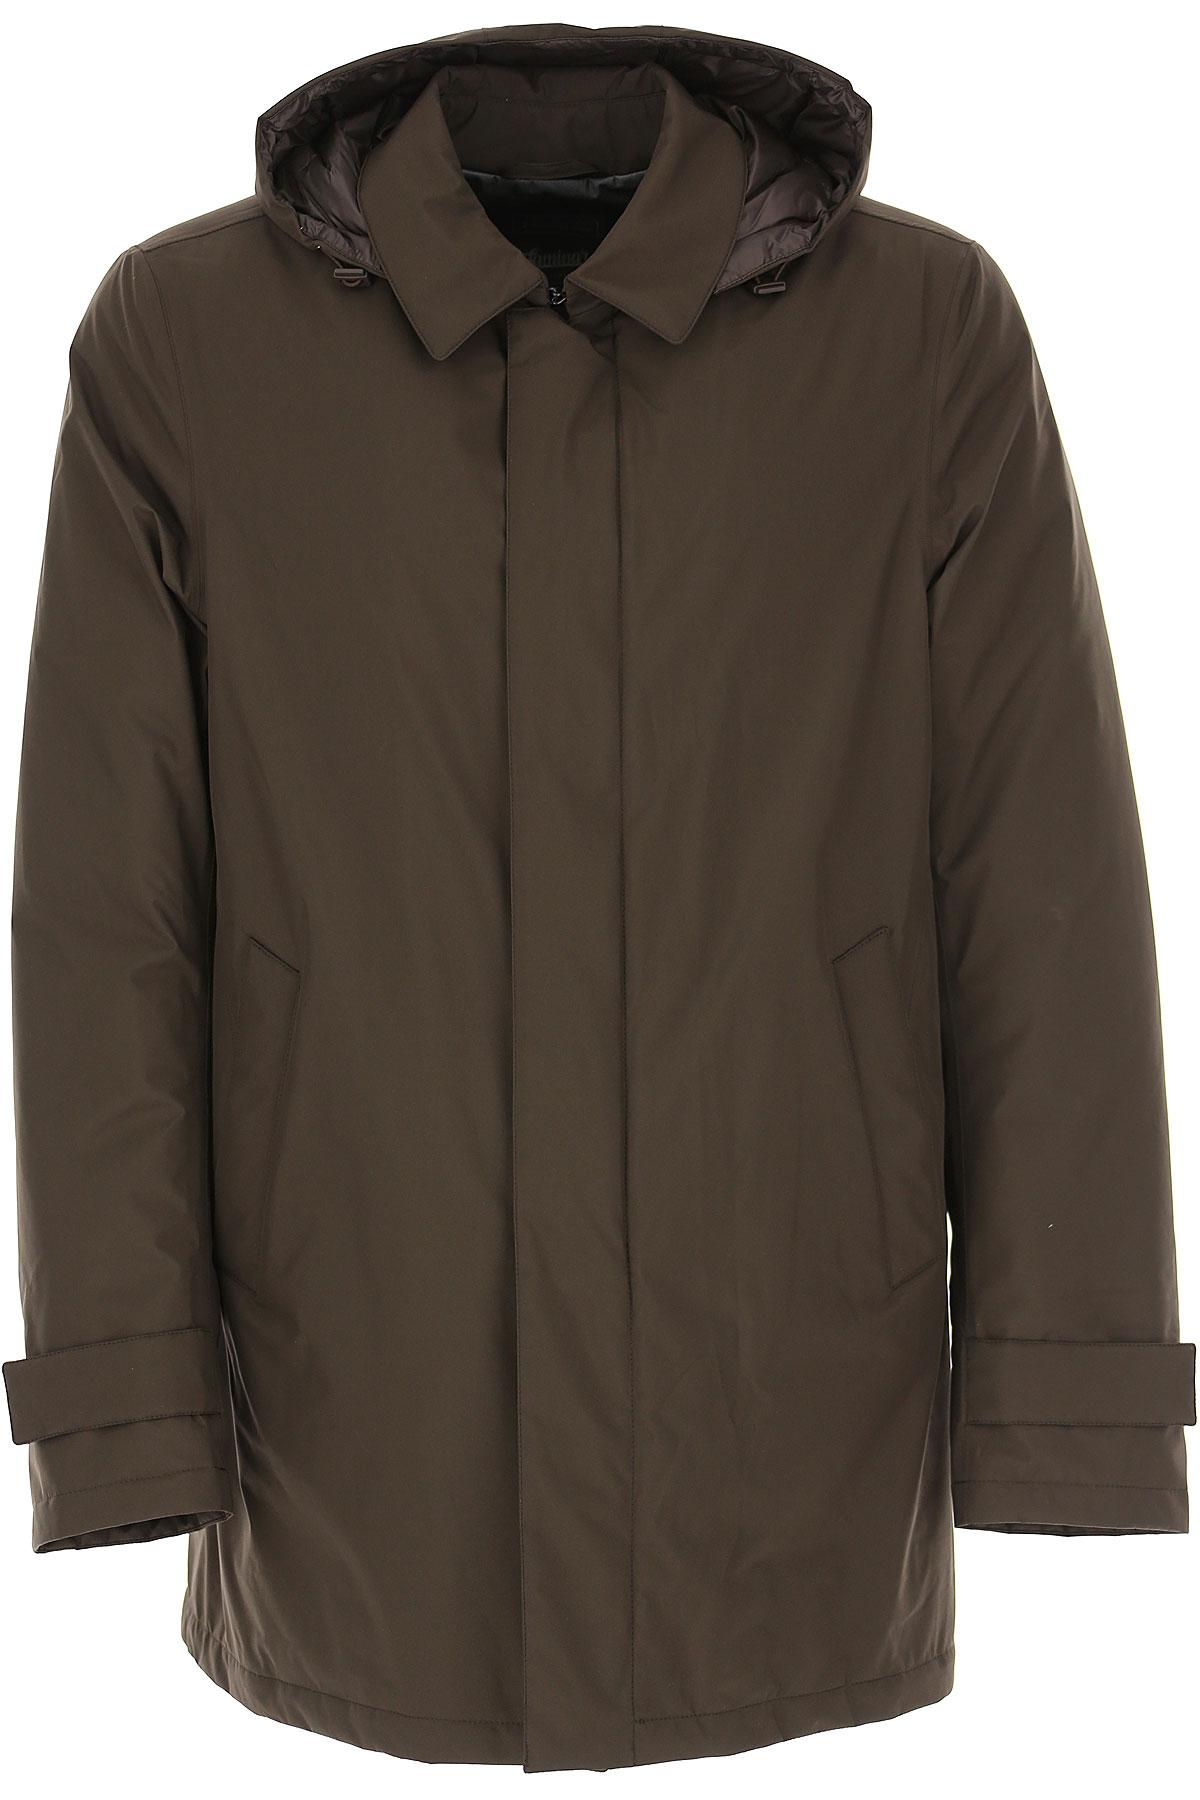 Herno Down Jacket for Men, Puffer Ski Jacket On Sale, Dark Cacao, polyester, 2019, L M S XL XXXL